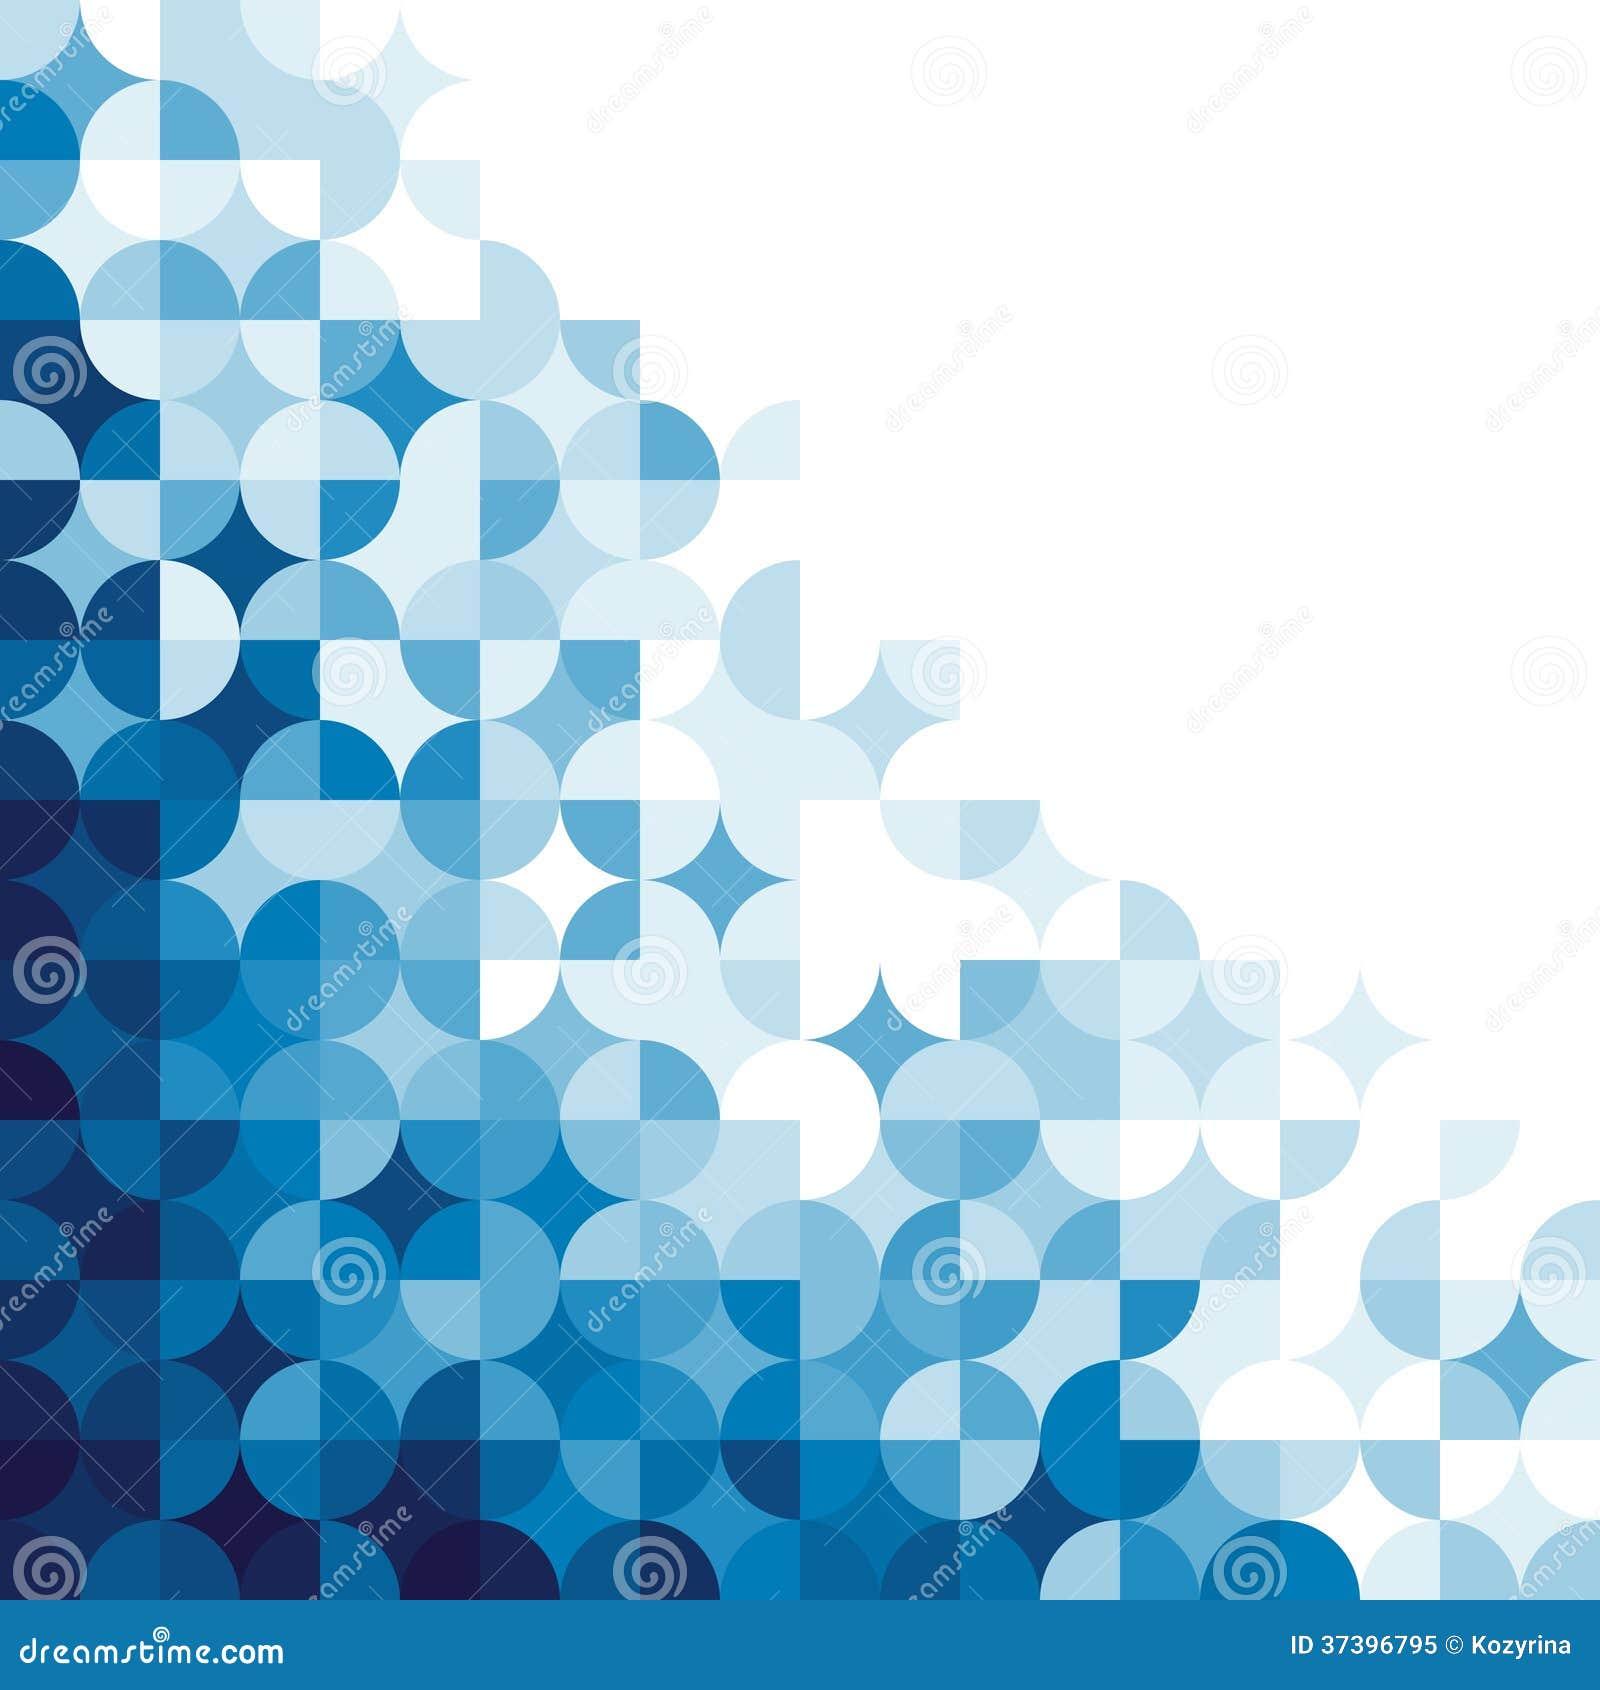 Abstract Geometric Pattern. Stock Image - Image: 37396795